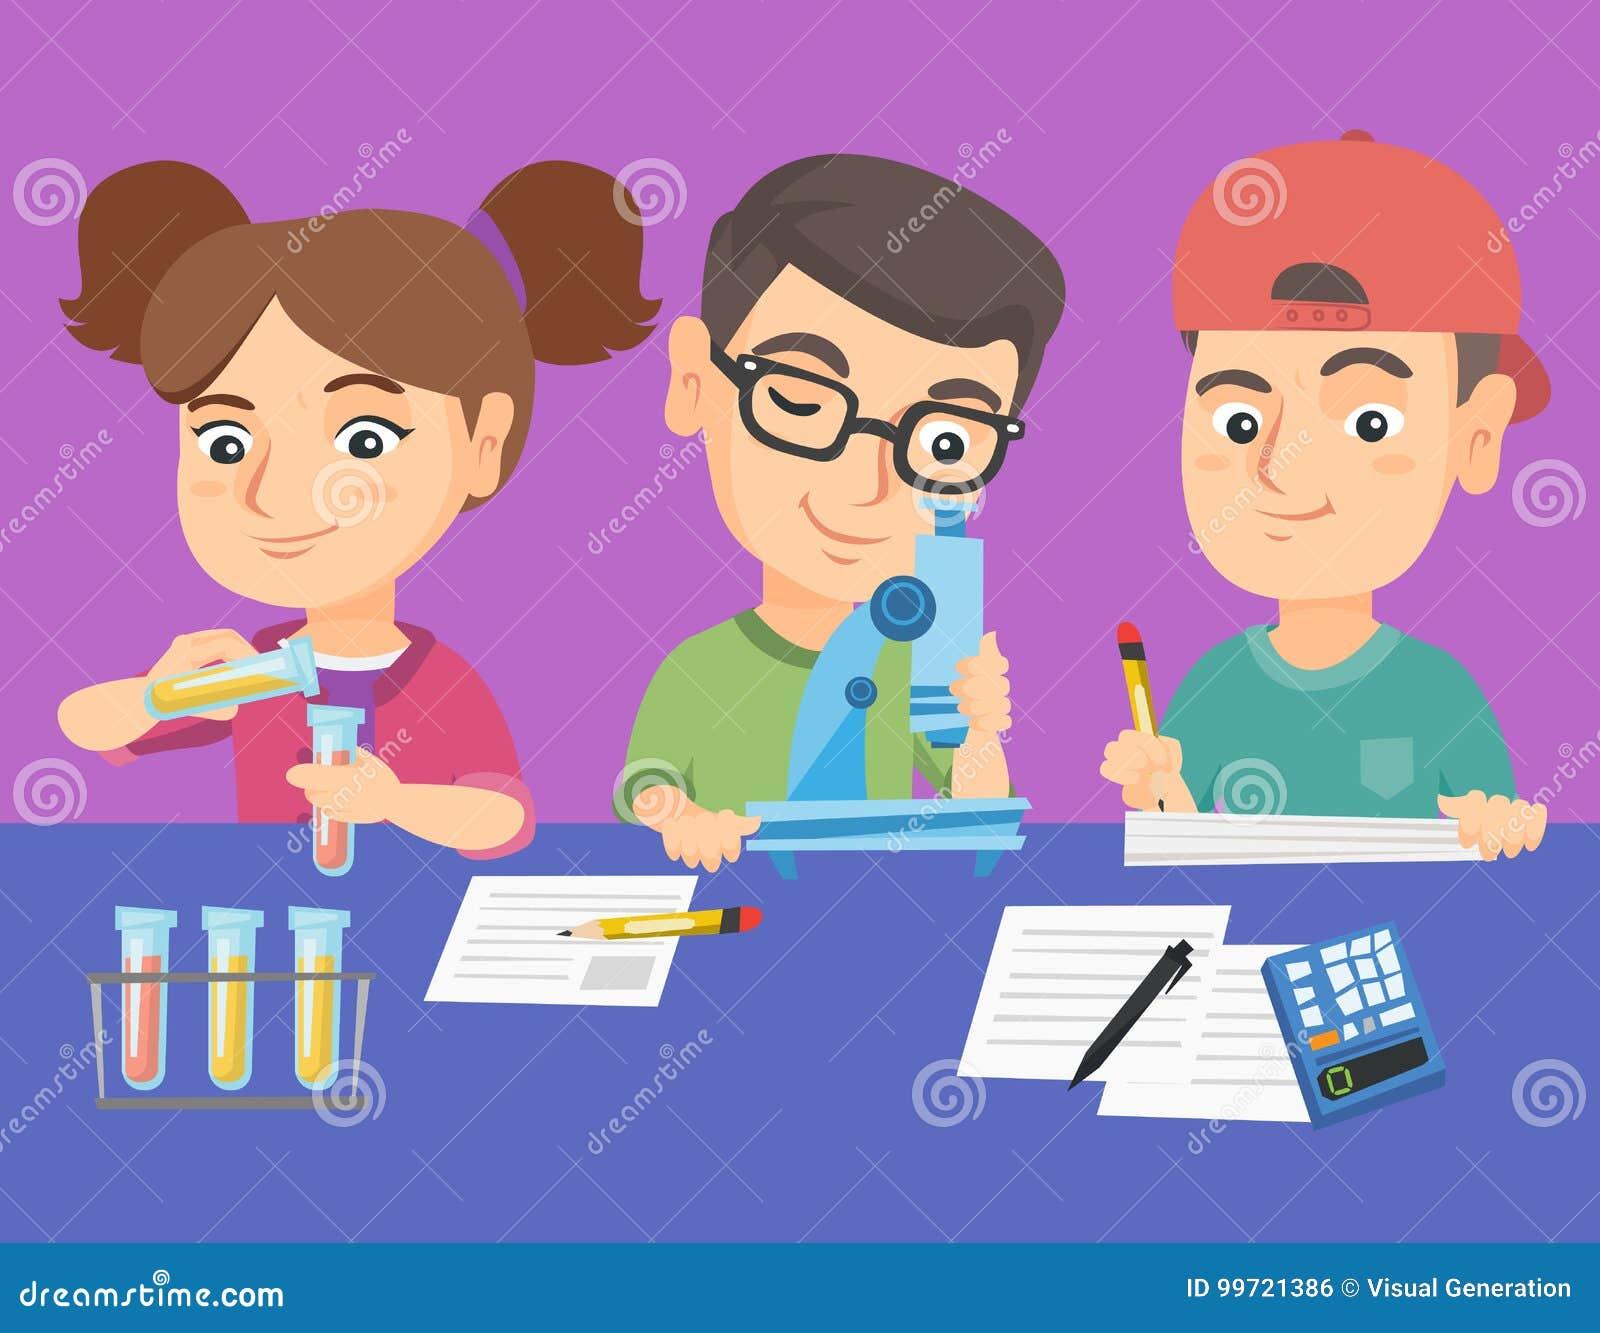 Caucasian Kids Making Chemical Experiment  Stock Vector